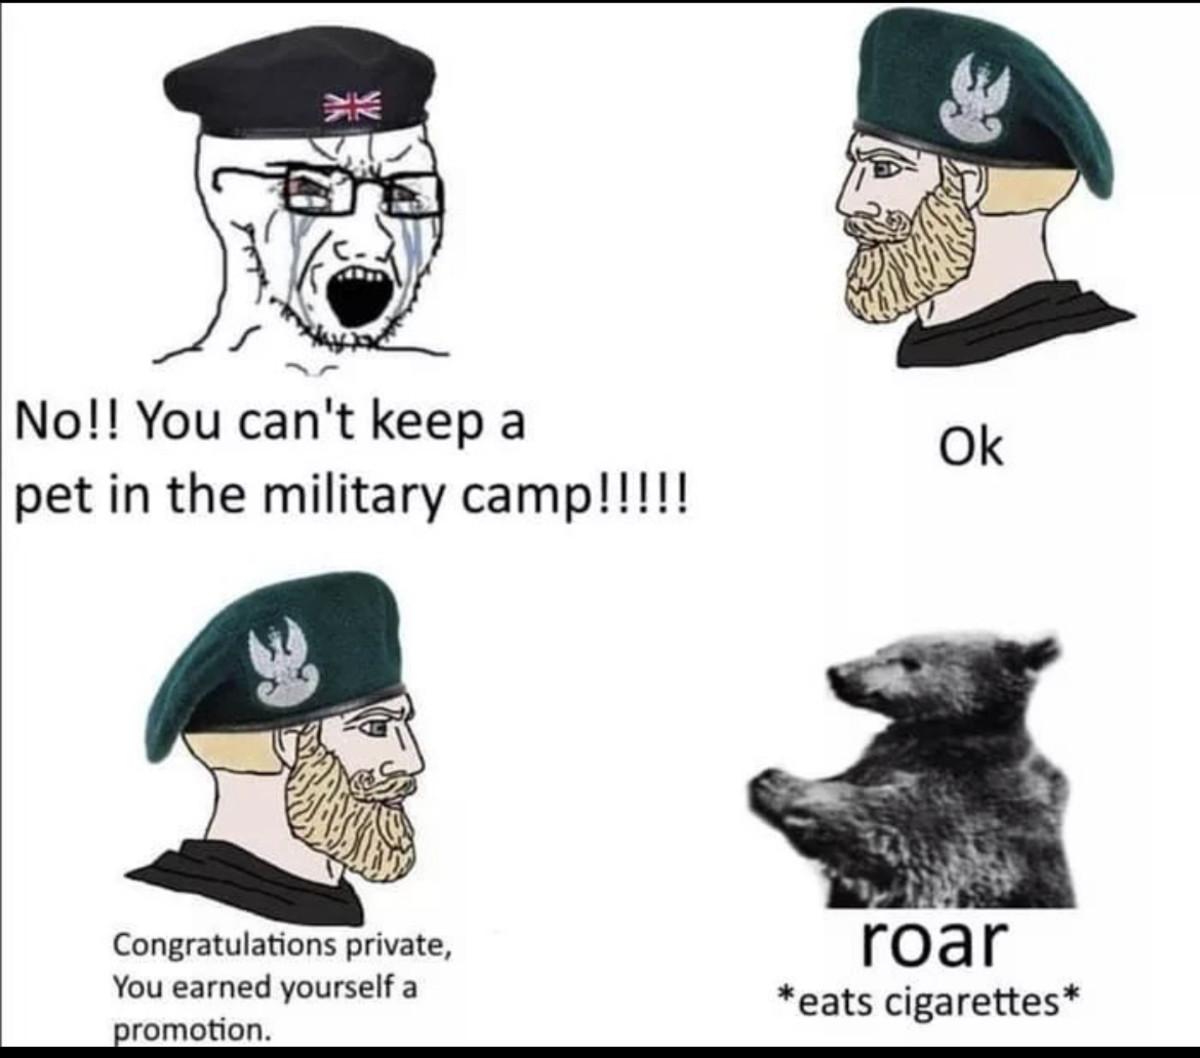 hopeless Dotterel. .. He was eventually promoted up to Corporal. https://en.wikipedia.org/wiki/Wojtek_(bear)